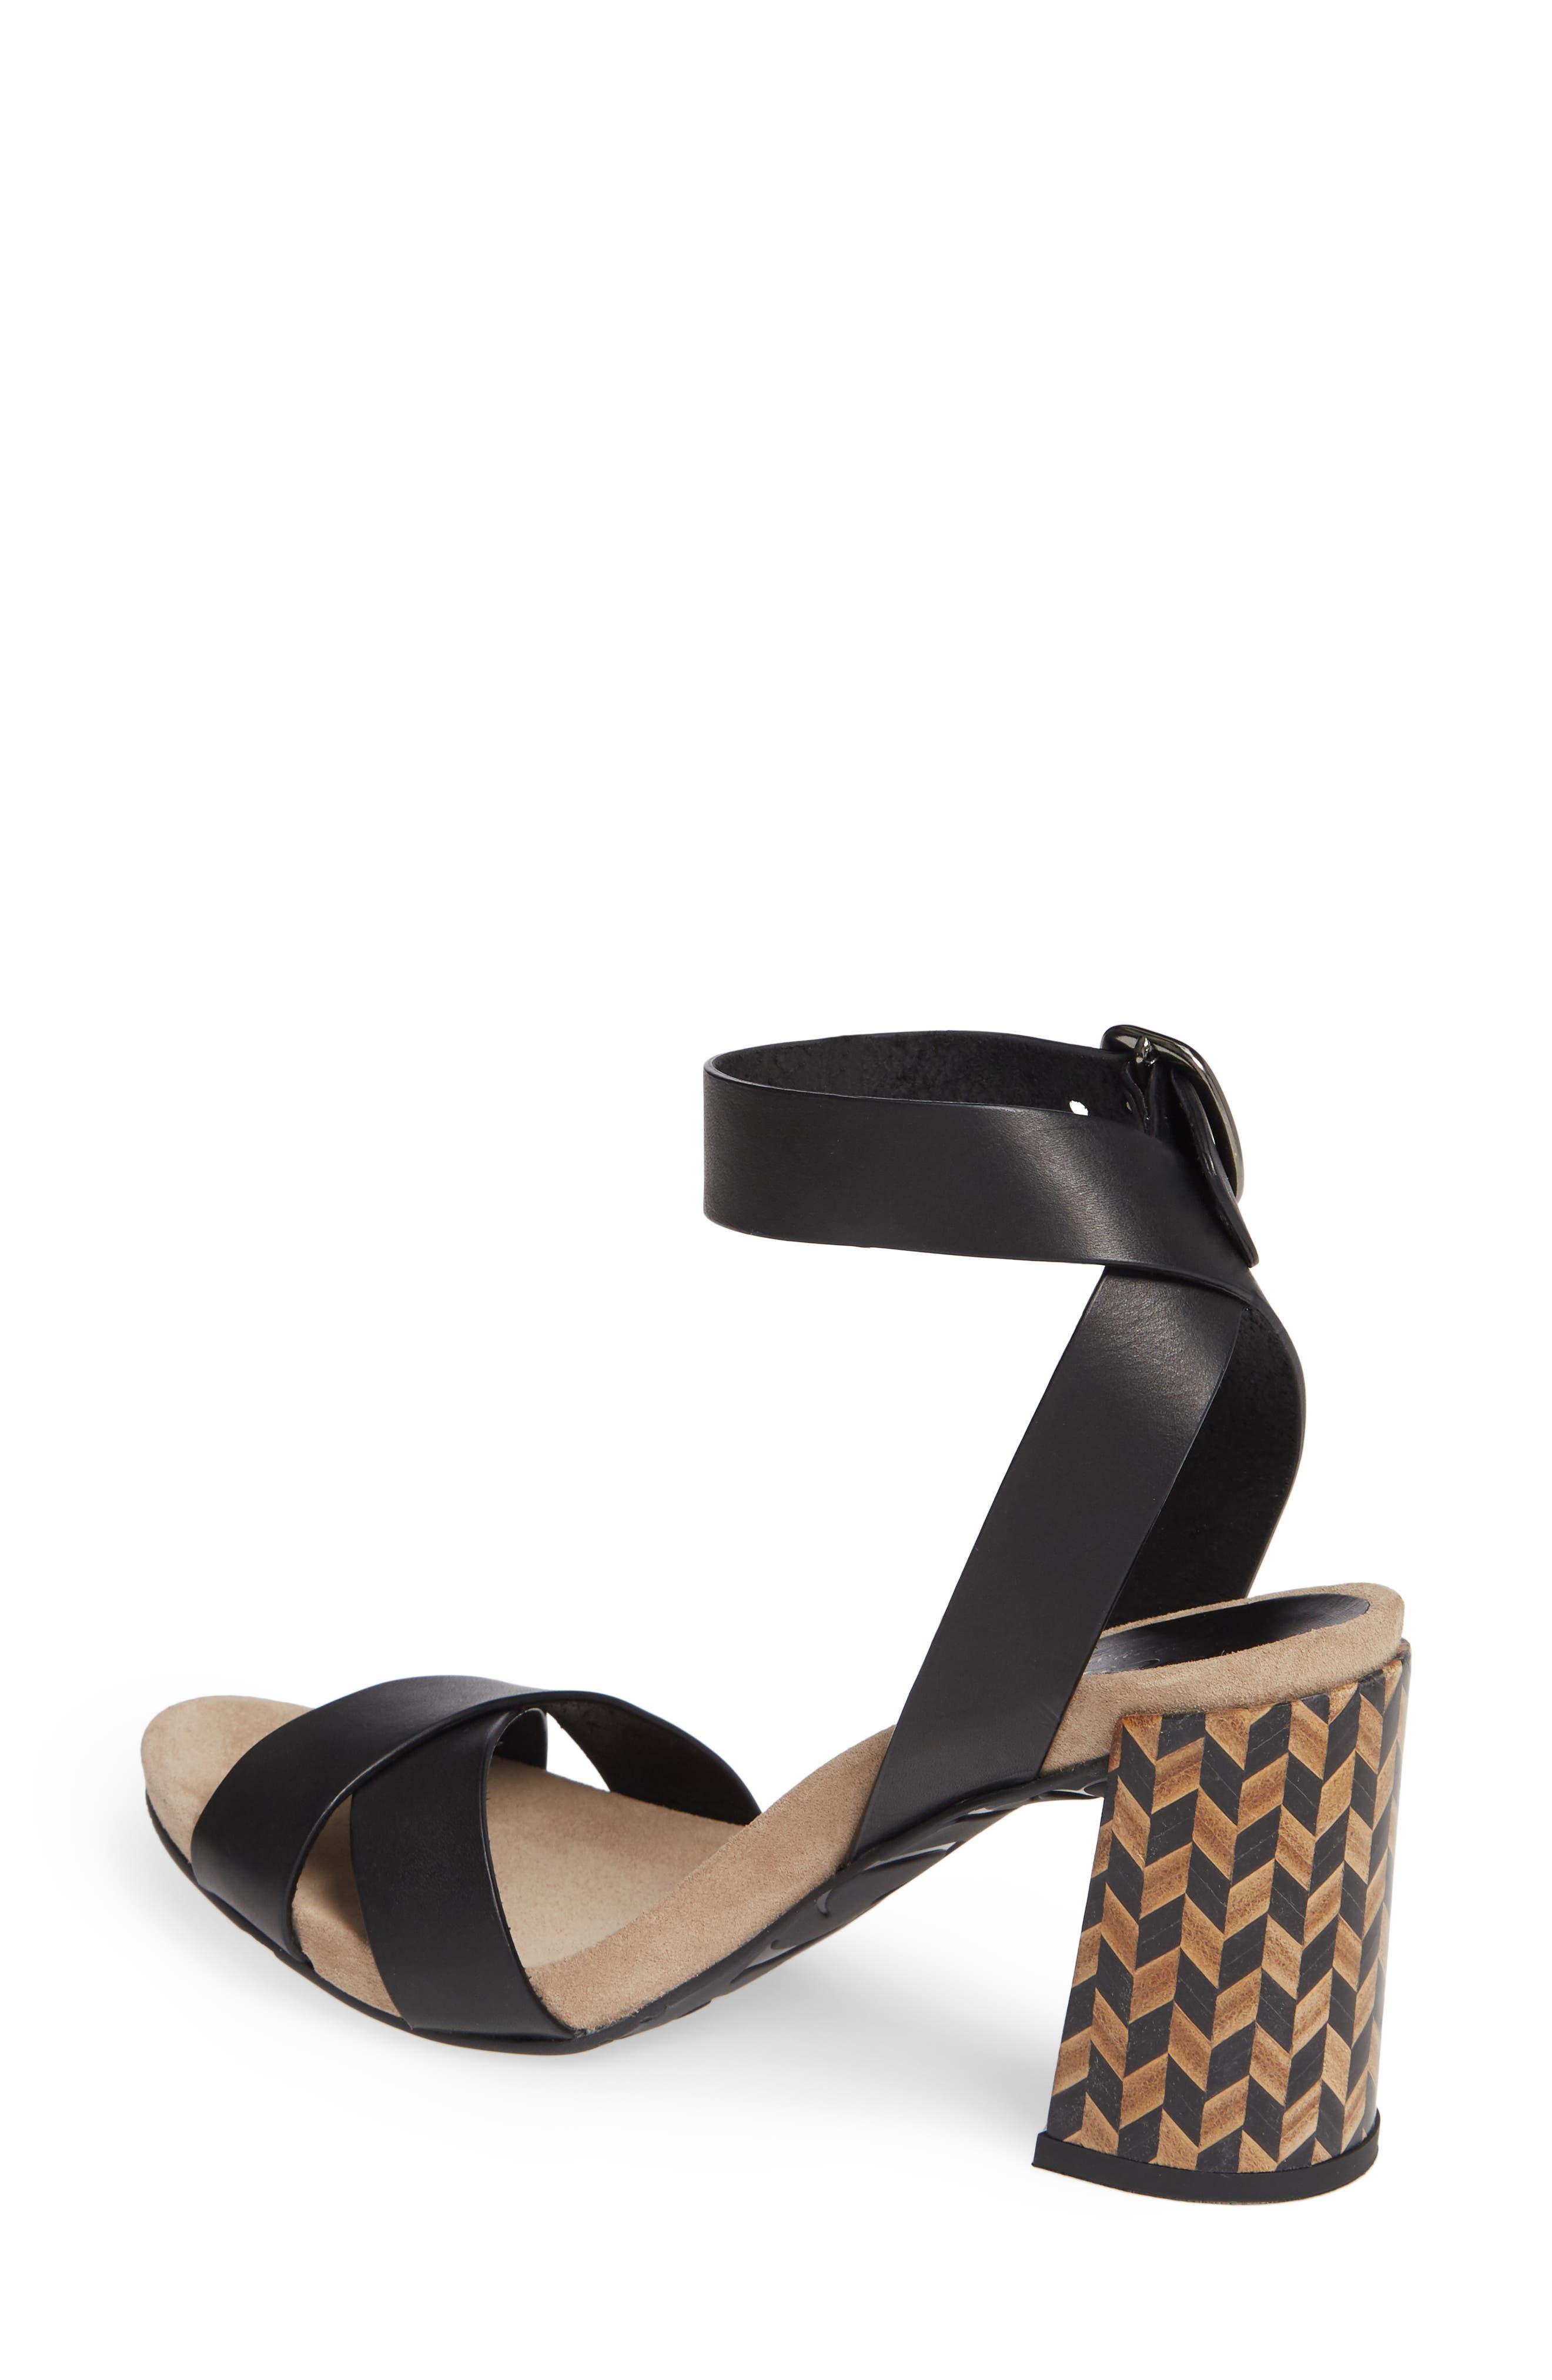 Yemba Embellished Heel Sandal,                             Alternate thumbnail 2, color,                             BLACK VACCHETTA